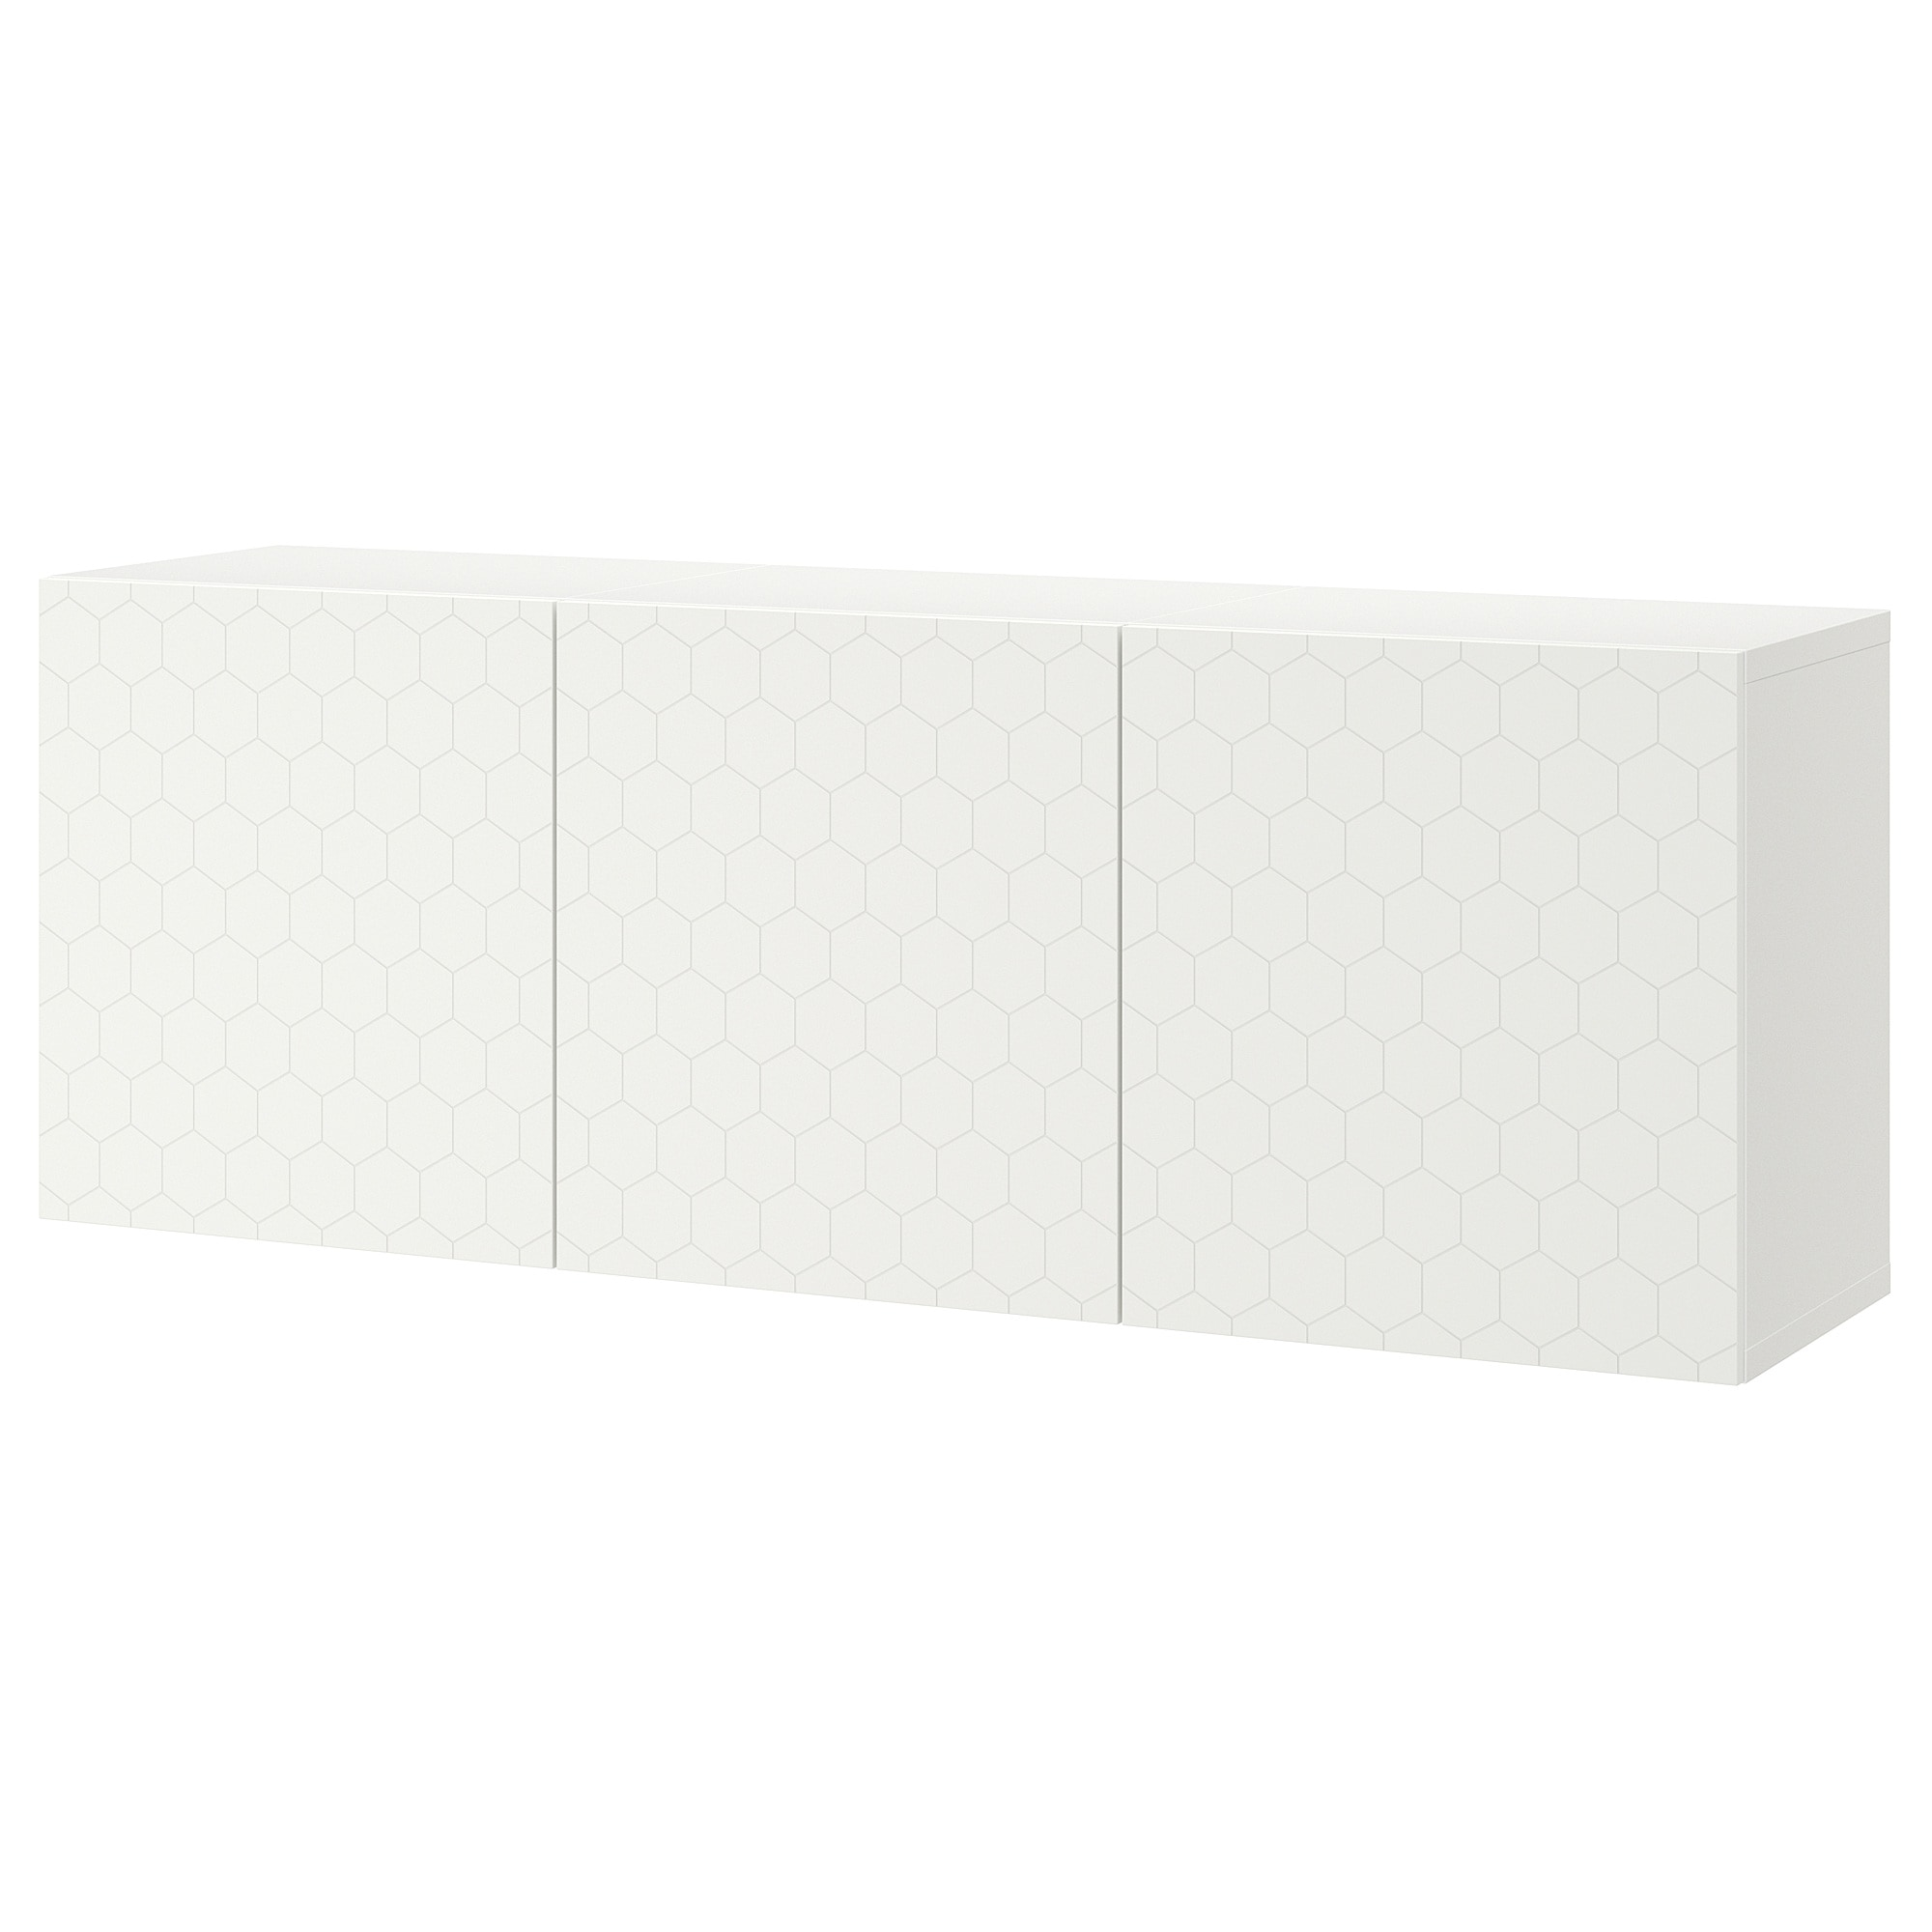 Ikea Bestå Wall Mounted Cabinet Combination White